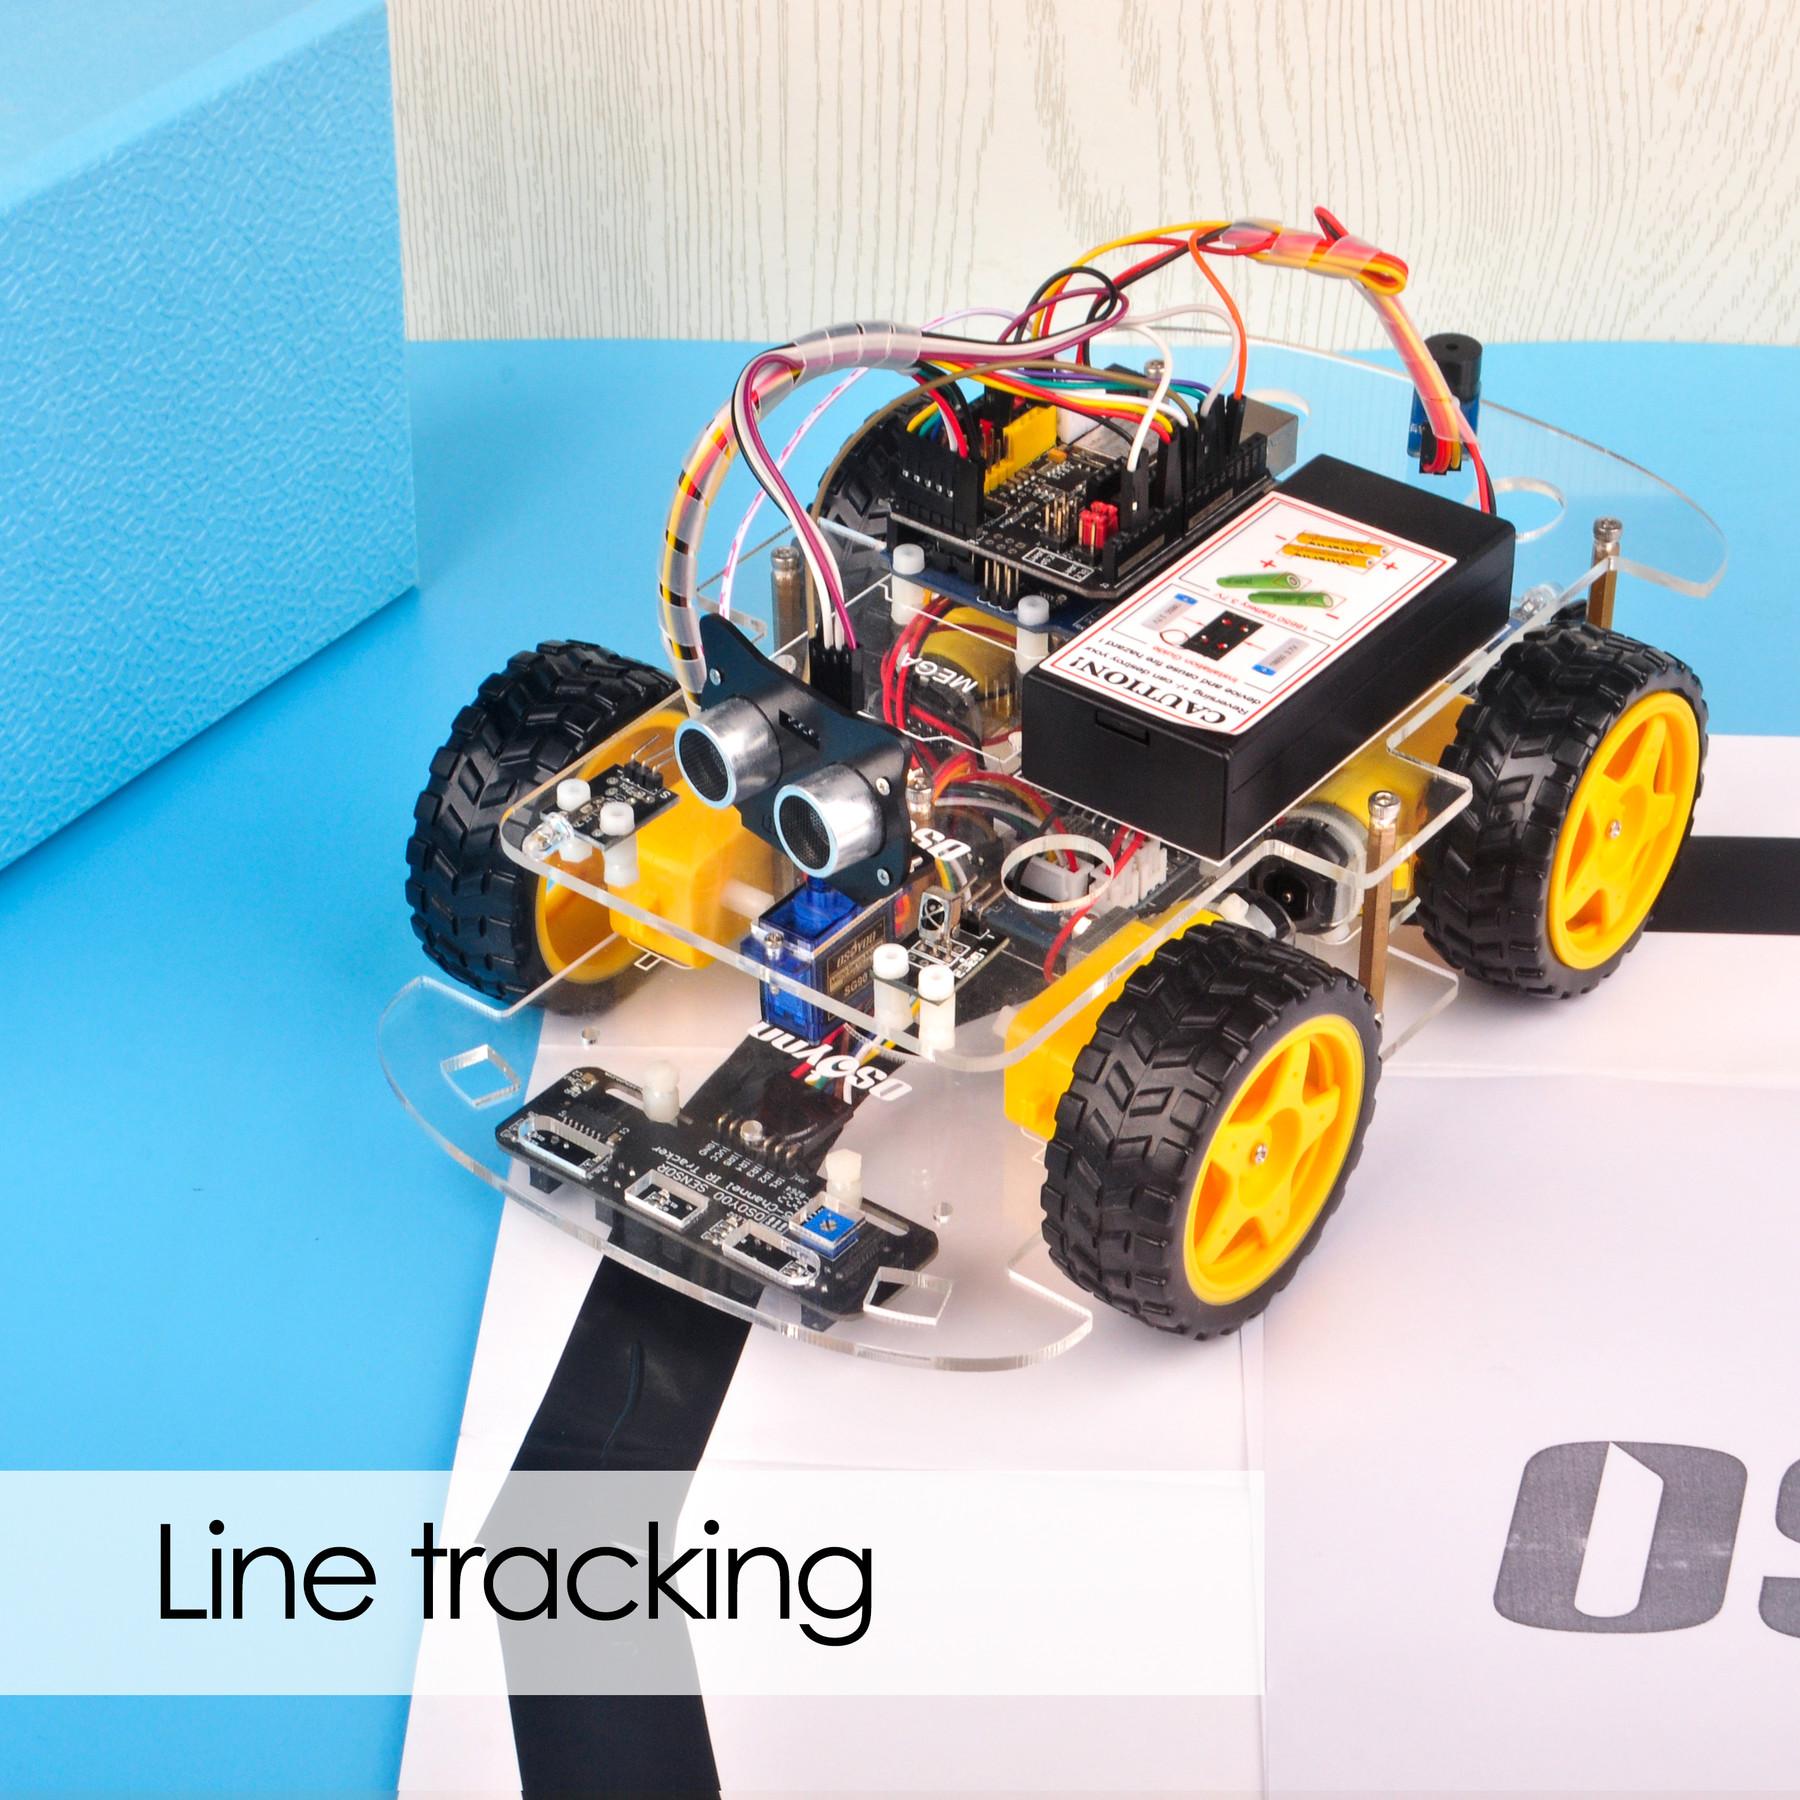 OSOYOO V2.1 Robot car kit Lesson 4: Tracking Line Robot Car